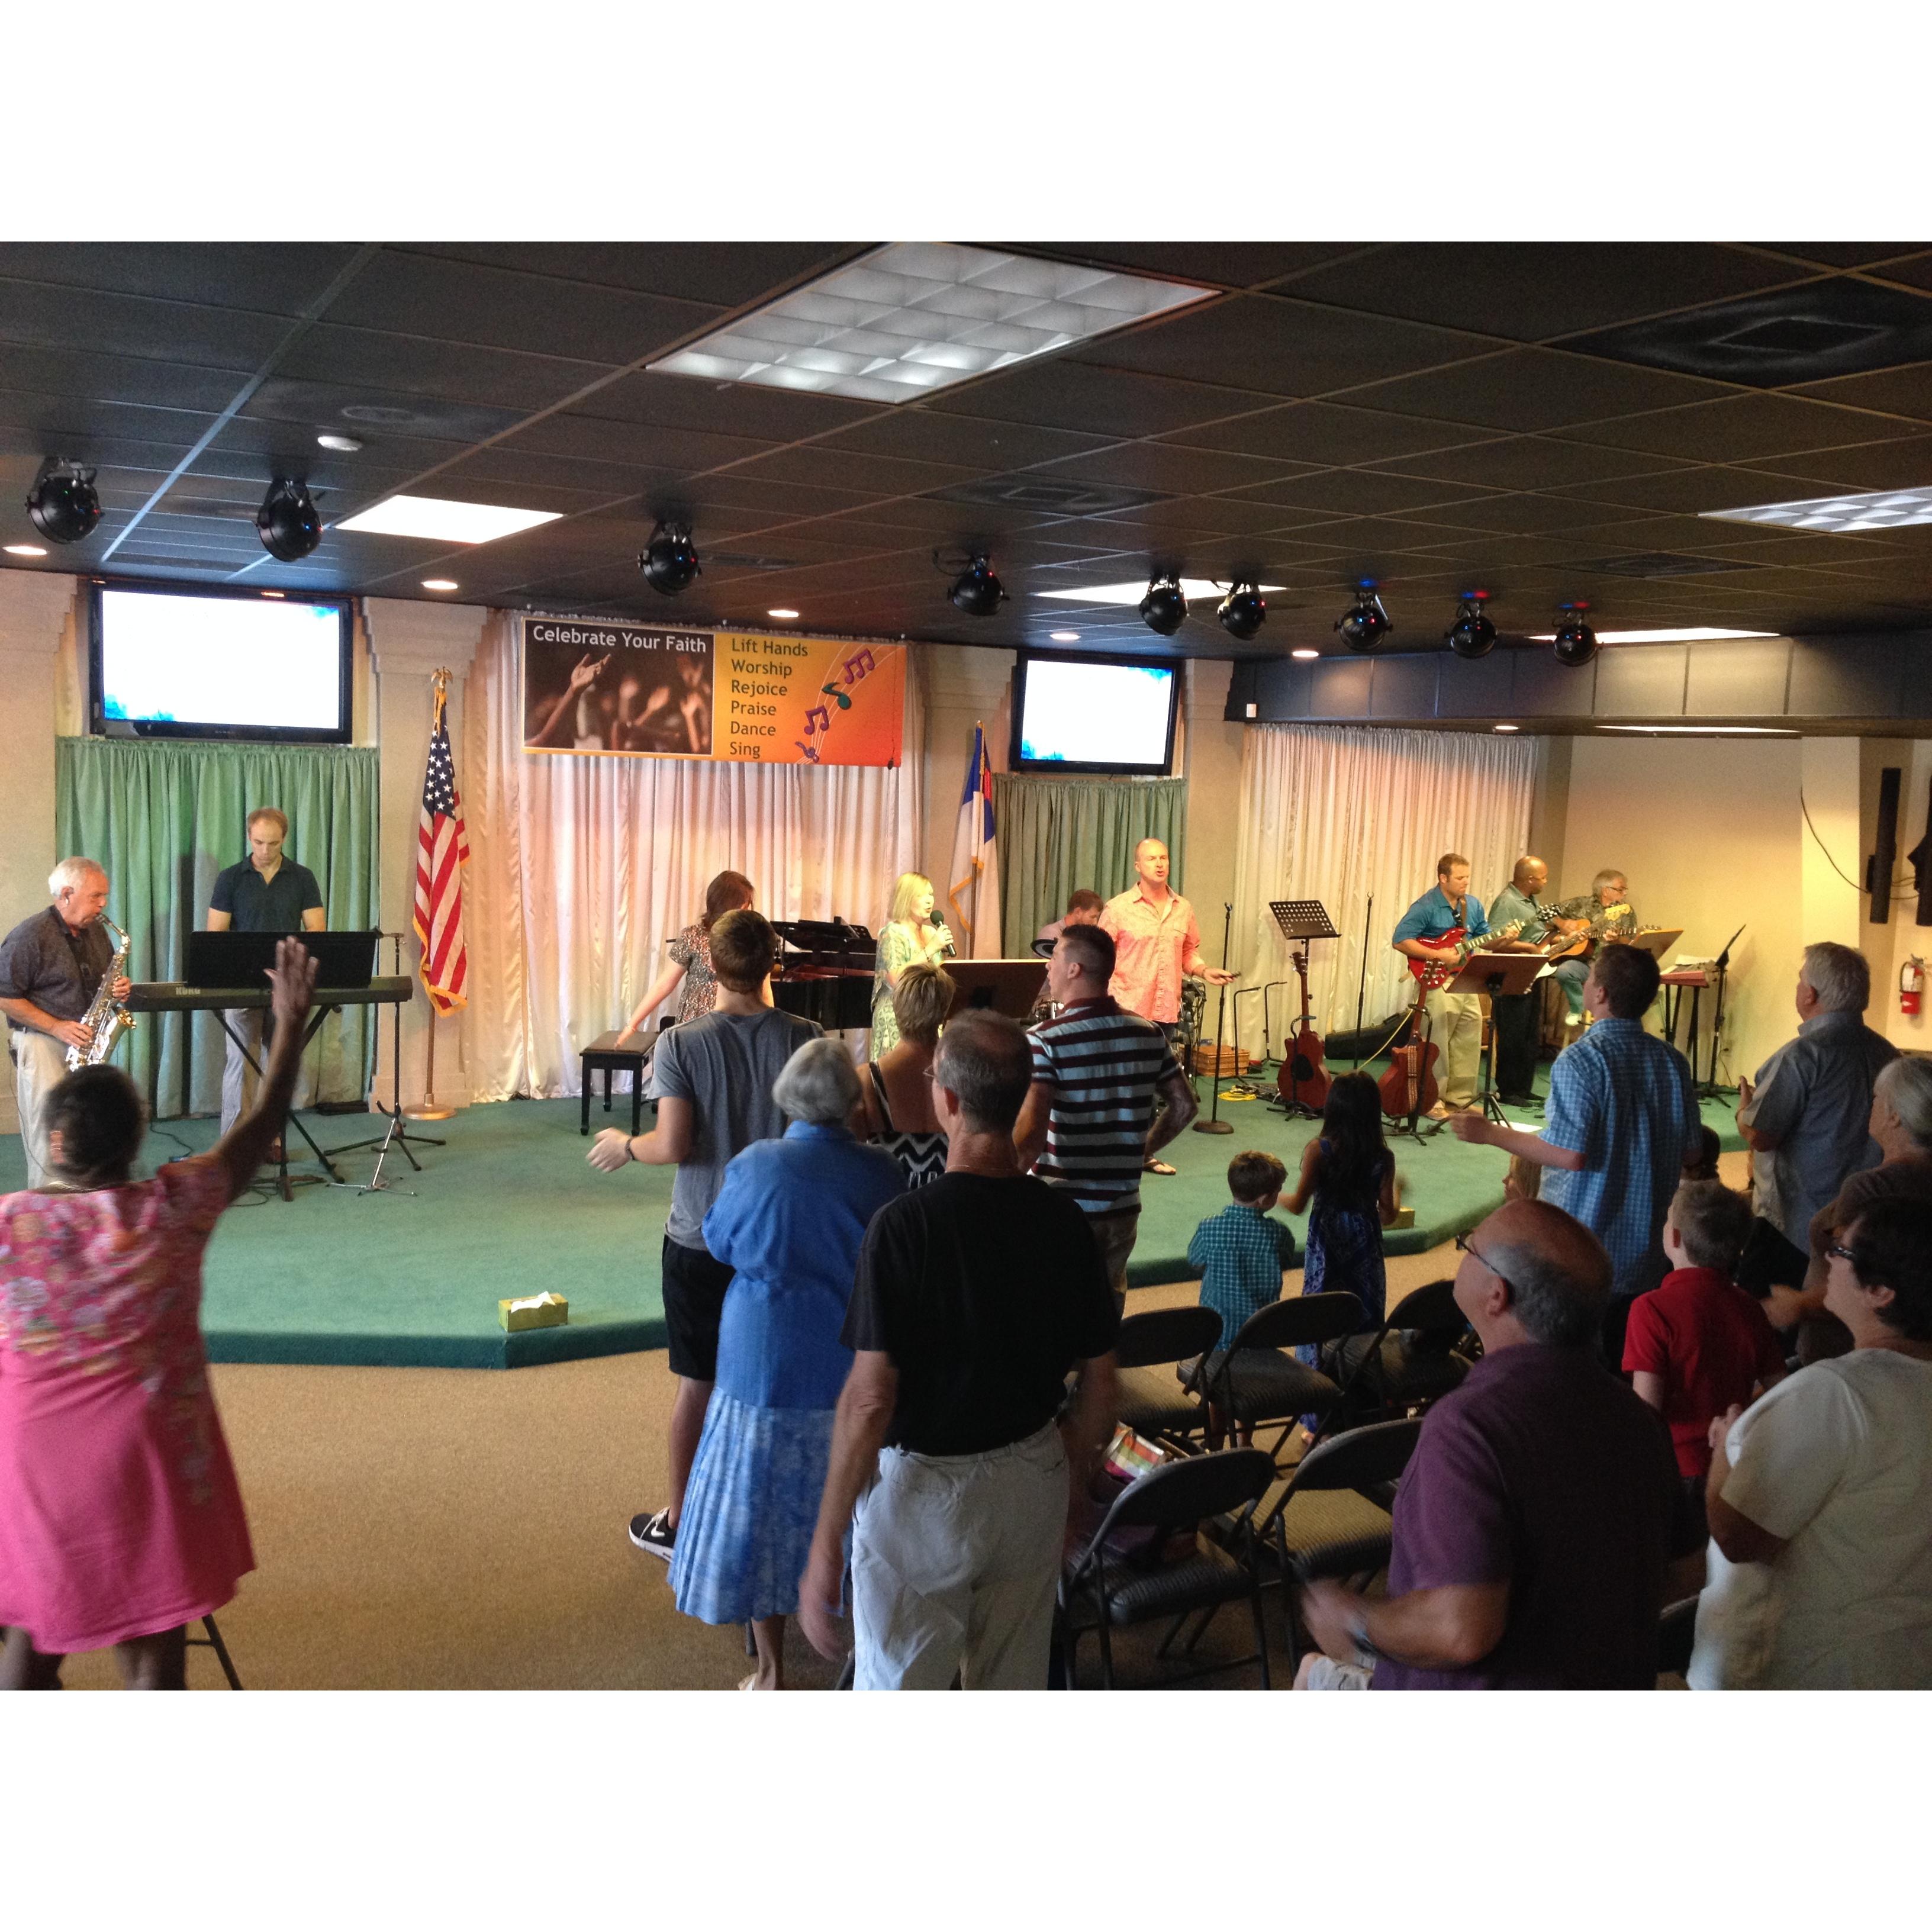 Glad Tidings Celebration and Faith Church image 4